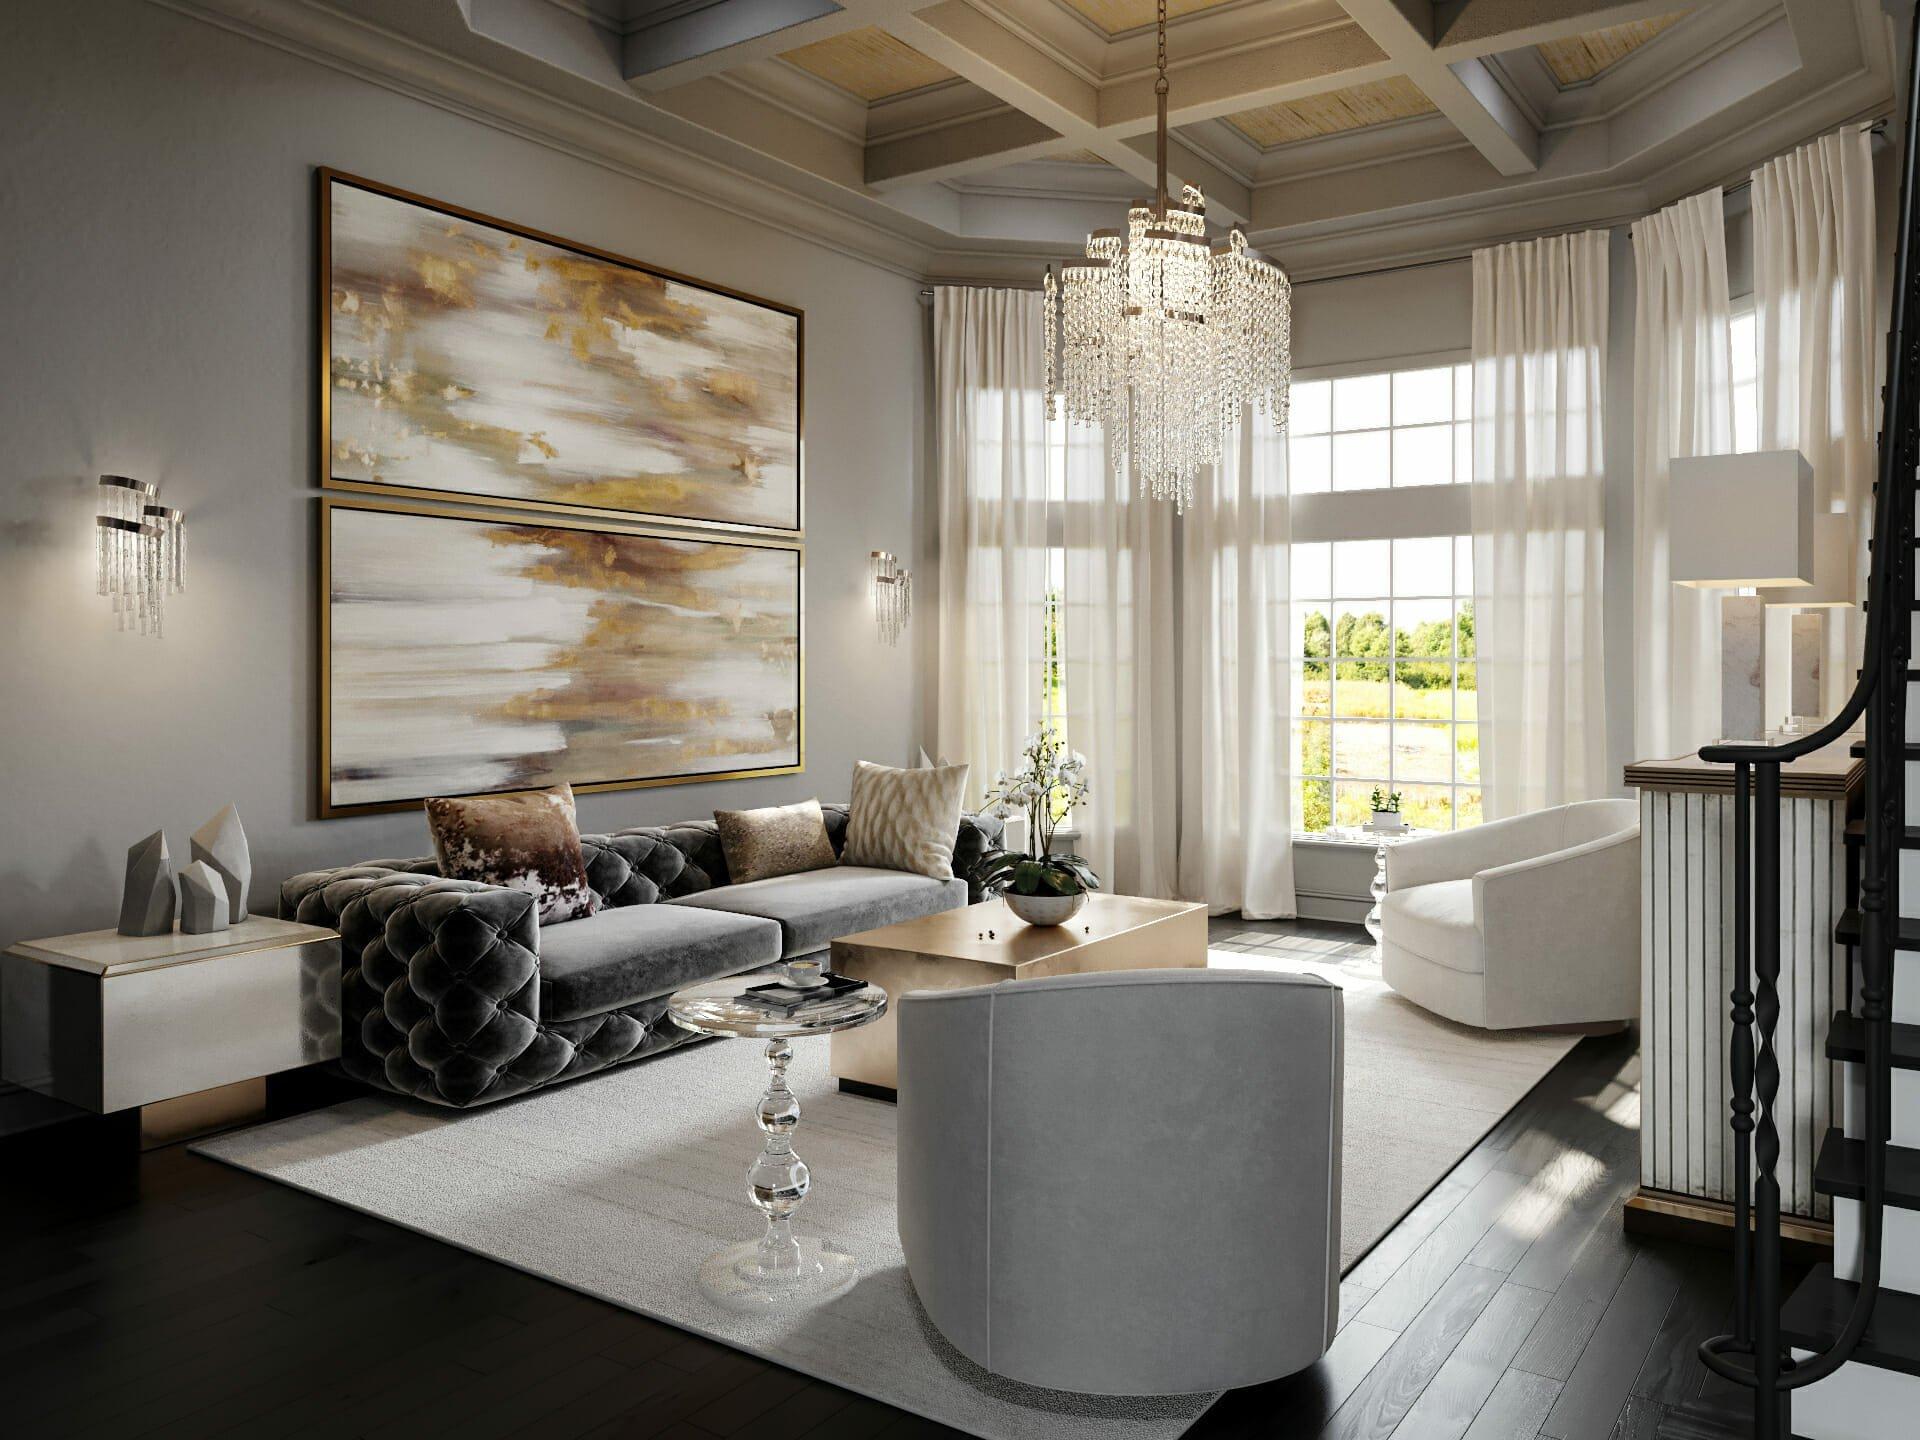 Glam Style Living Room by Decorilla designer Tera S